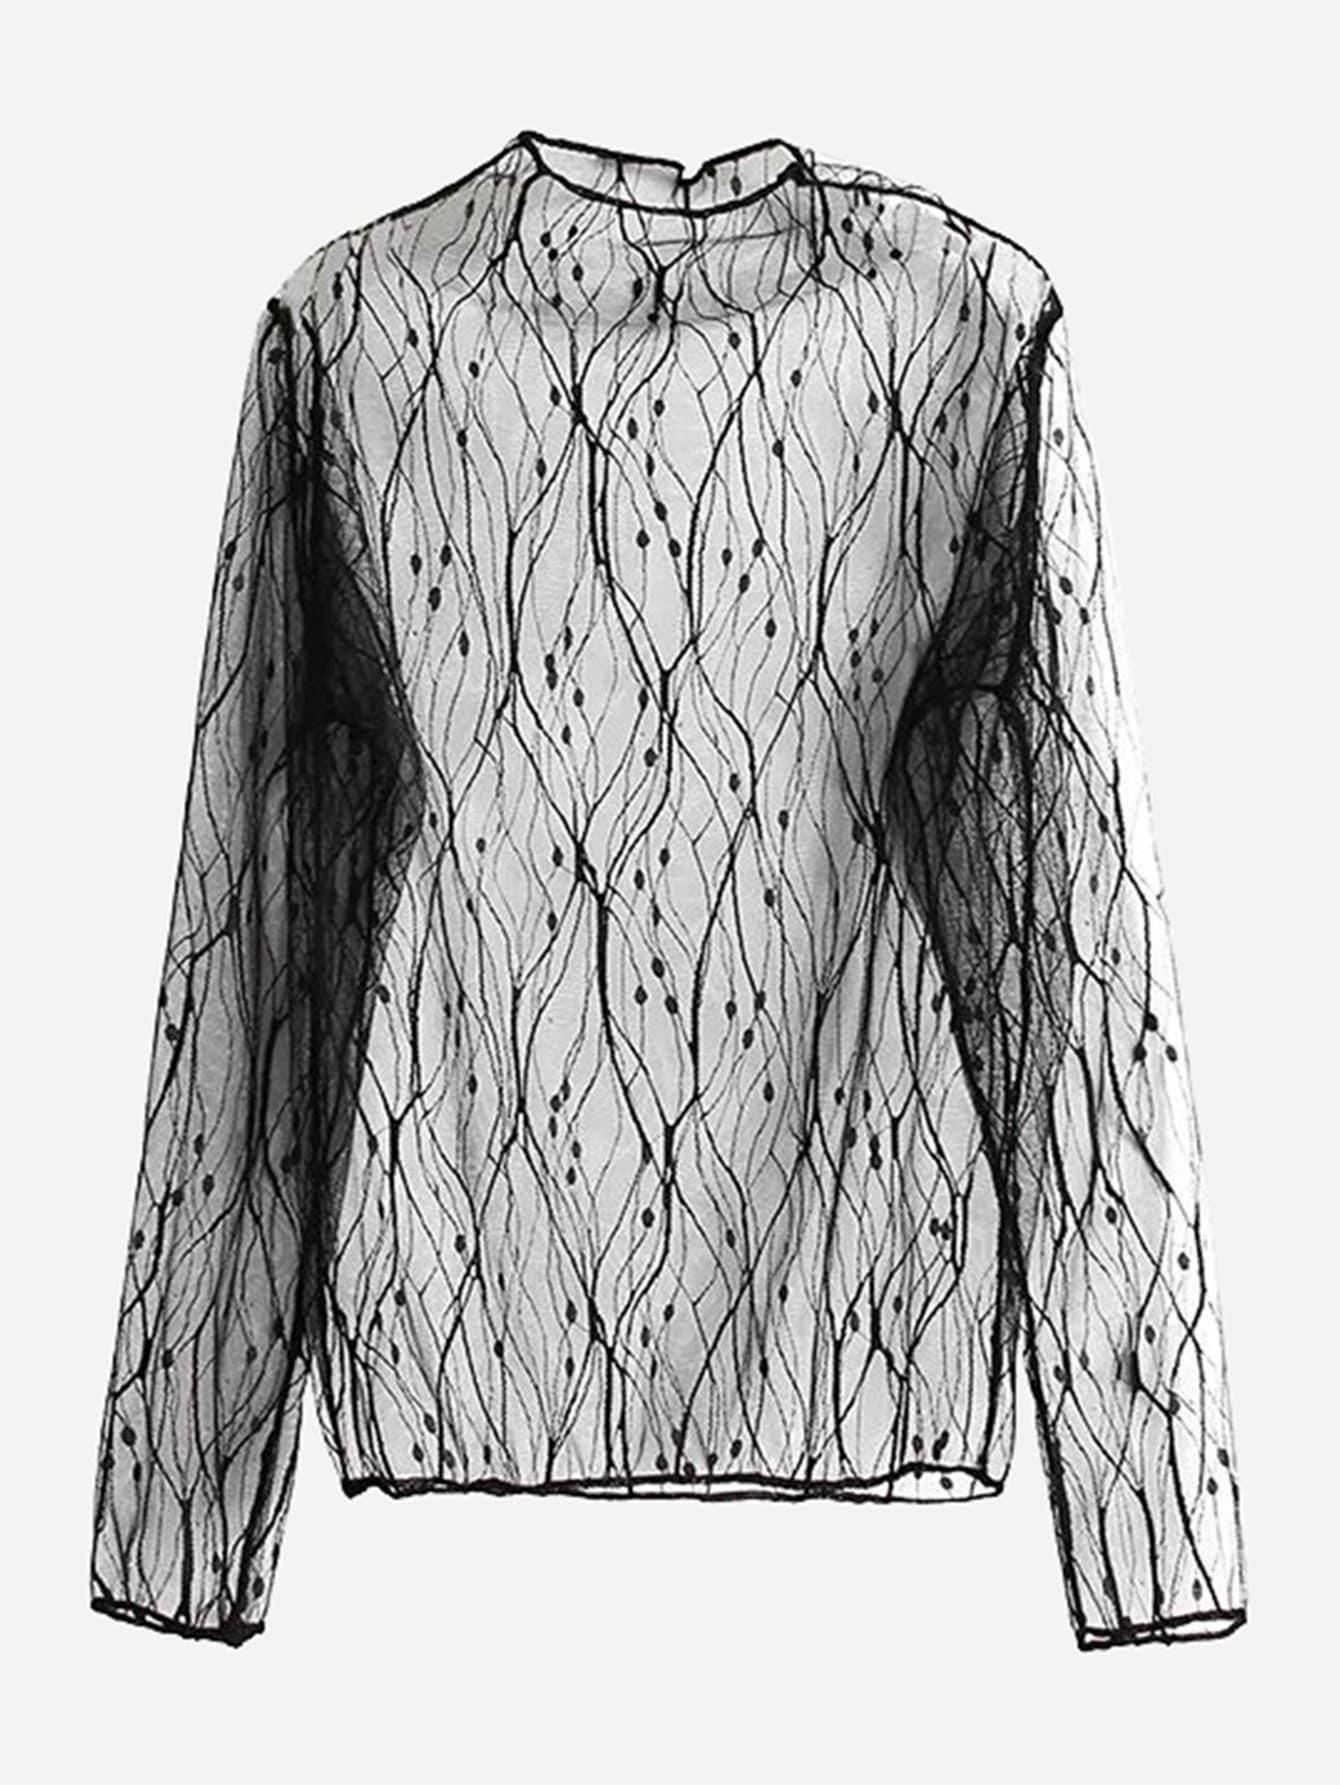 Купить Прозрачная блузка, null, SheIn